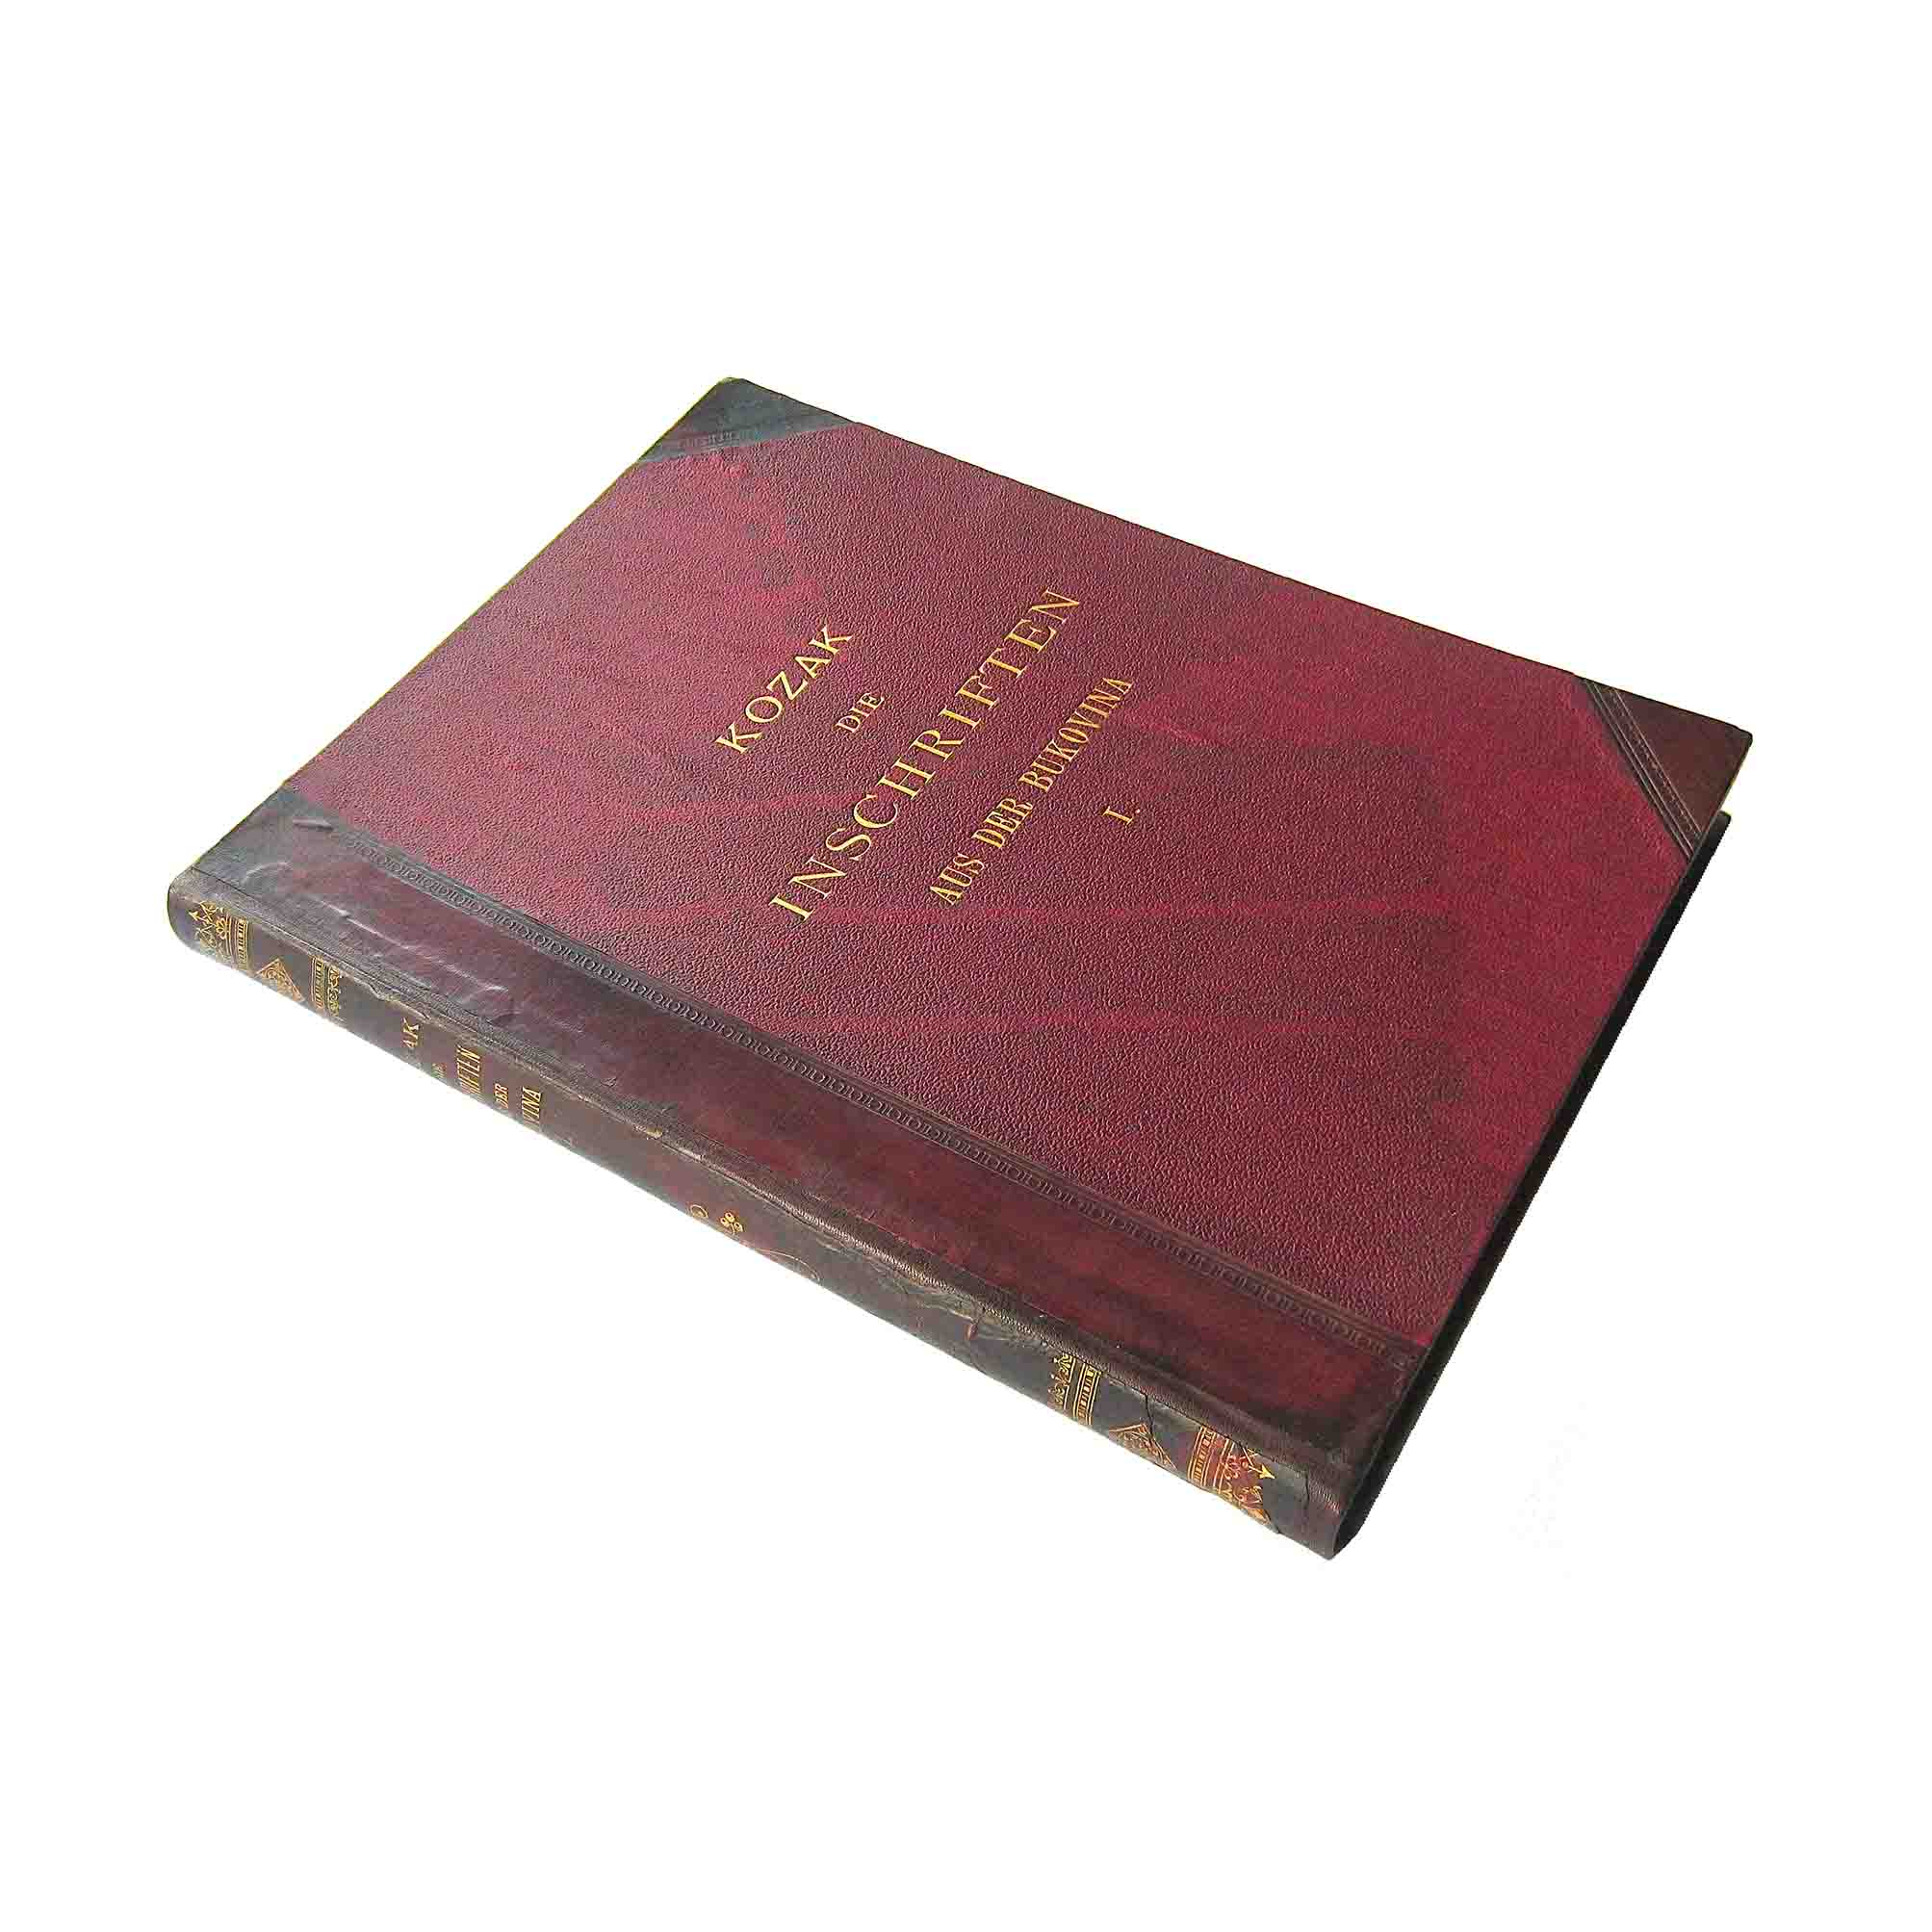 5580-Kozak-Inschriften-Bukovina-1903-Einband-frei-N.jpg